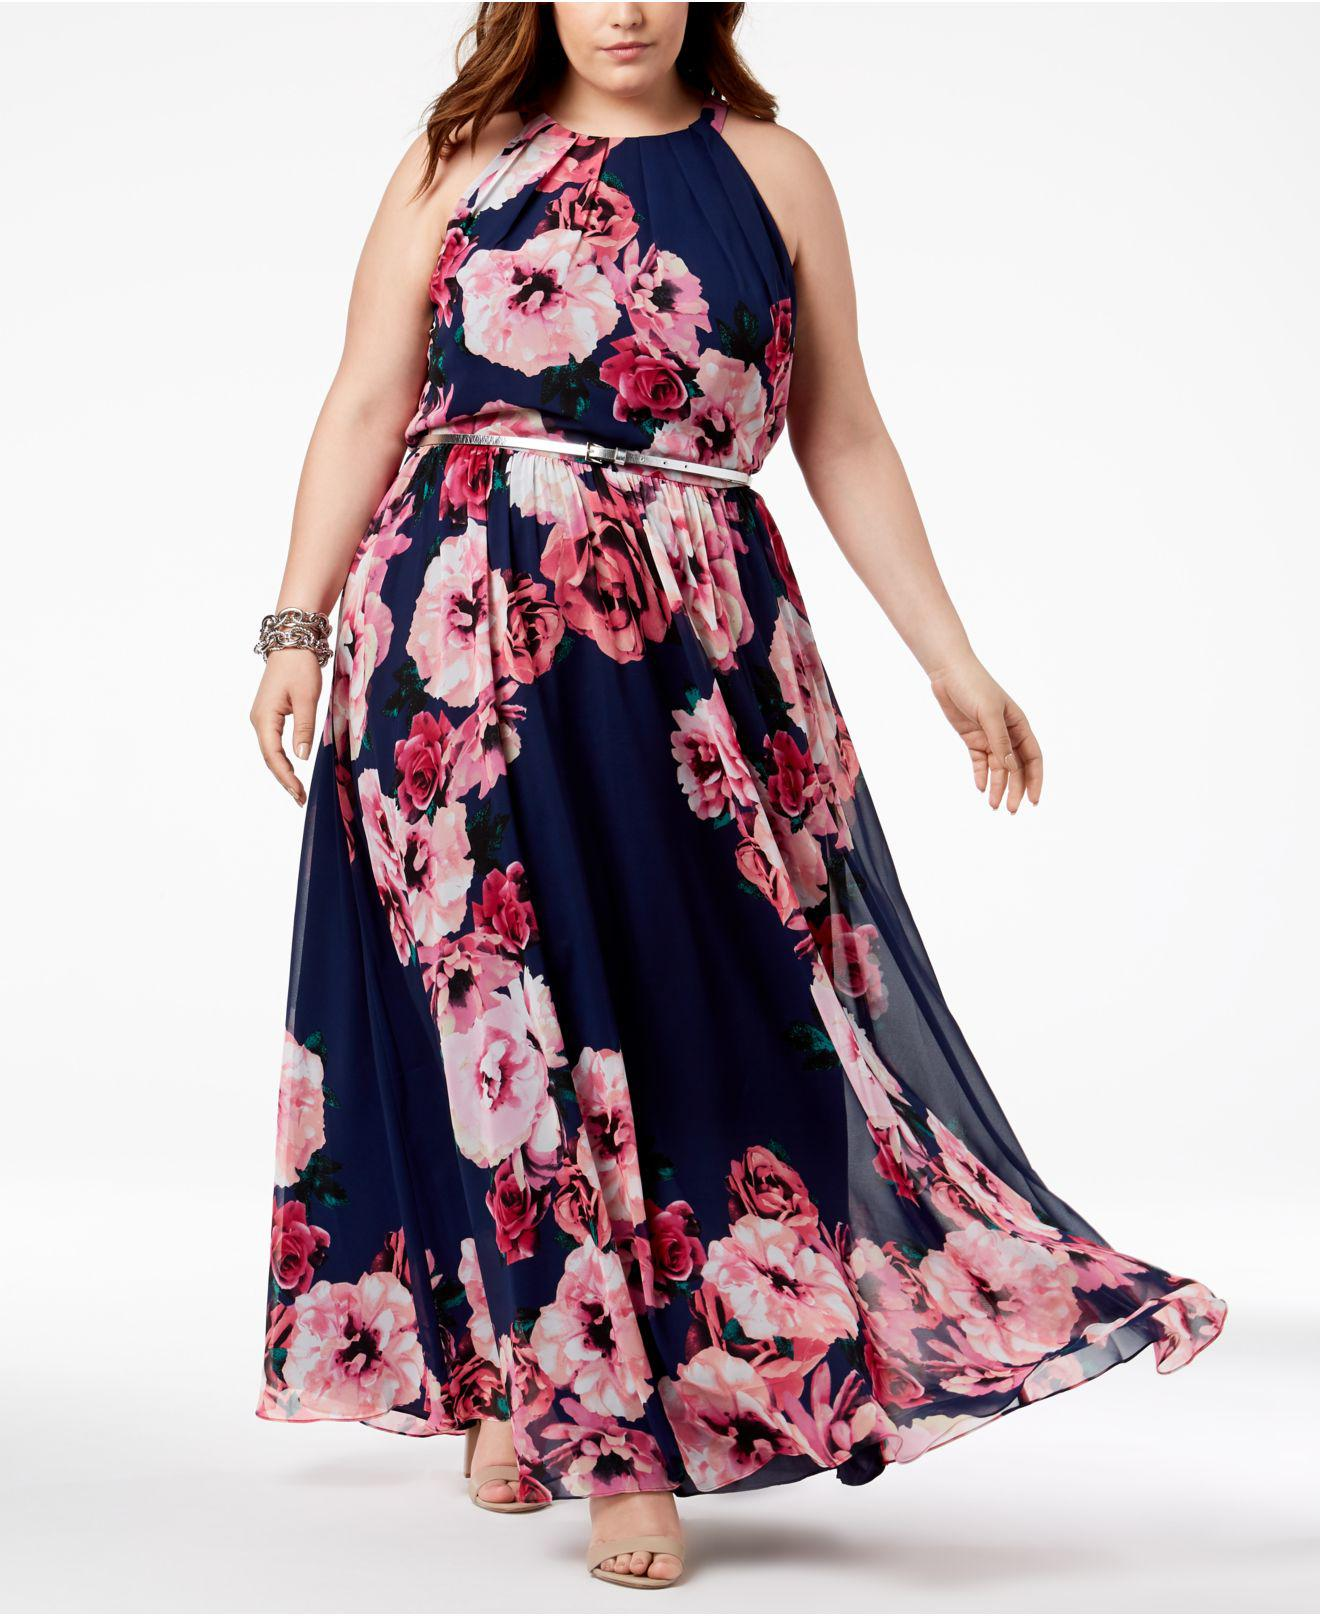 Plus Size Dresses At Macys   Huston Fislar Photography